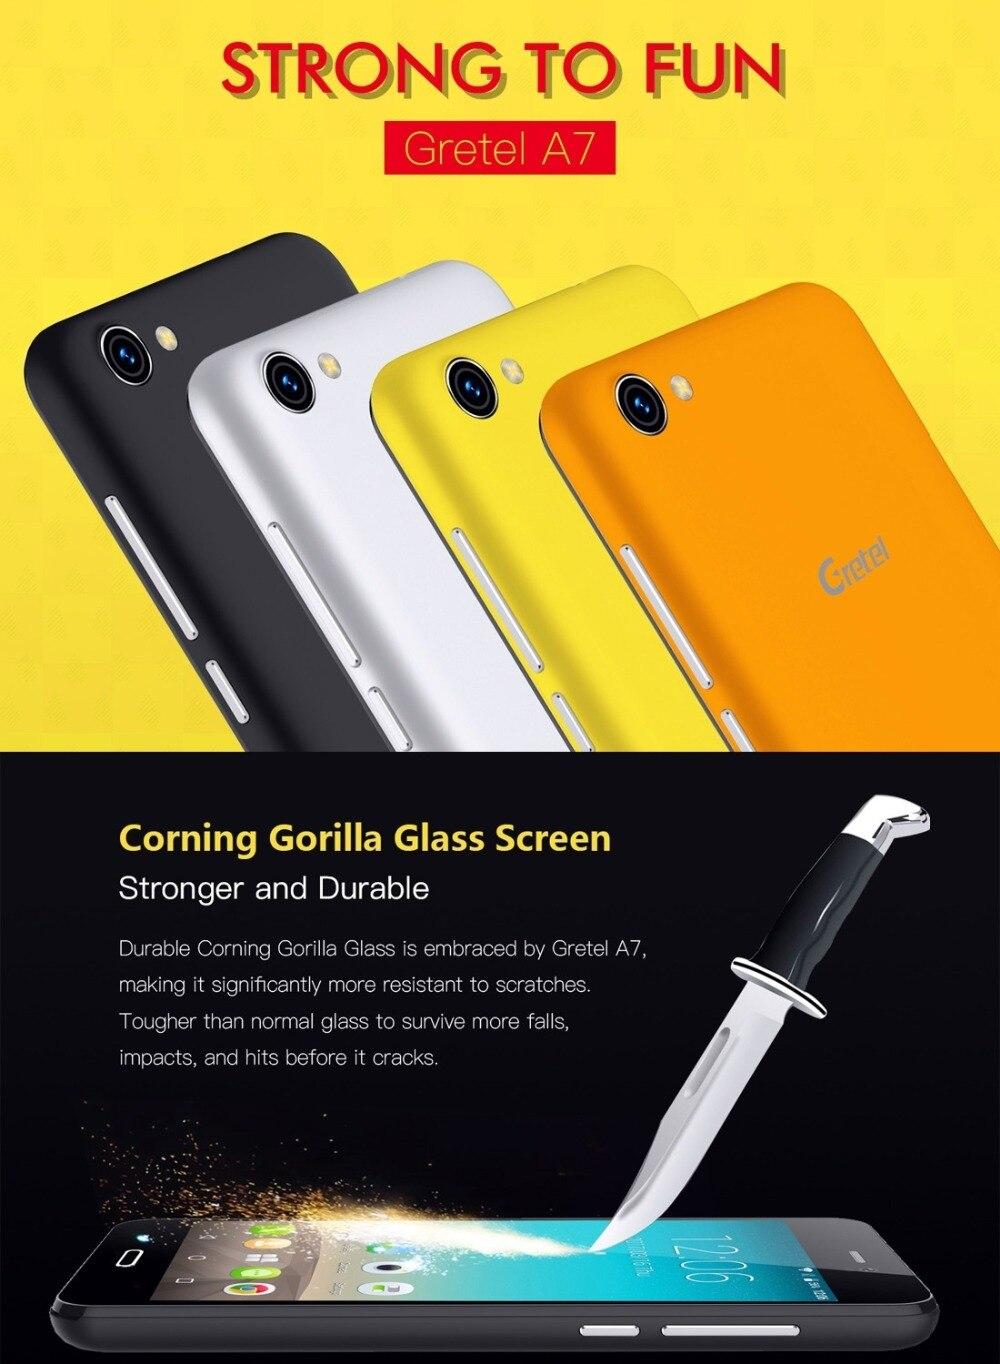 Gretel A7 4.7 ''Teléfono Móvil MTK6580 Quad A Core Android 6.0 1 GB RAM 16 GB ROM 1280x720 2000 mah Batería 3G WCDMA Smartphone GPS